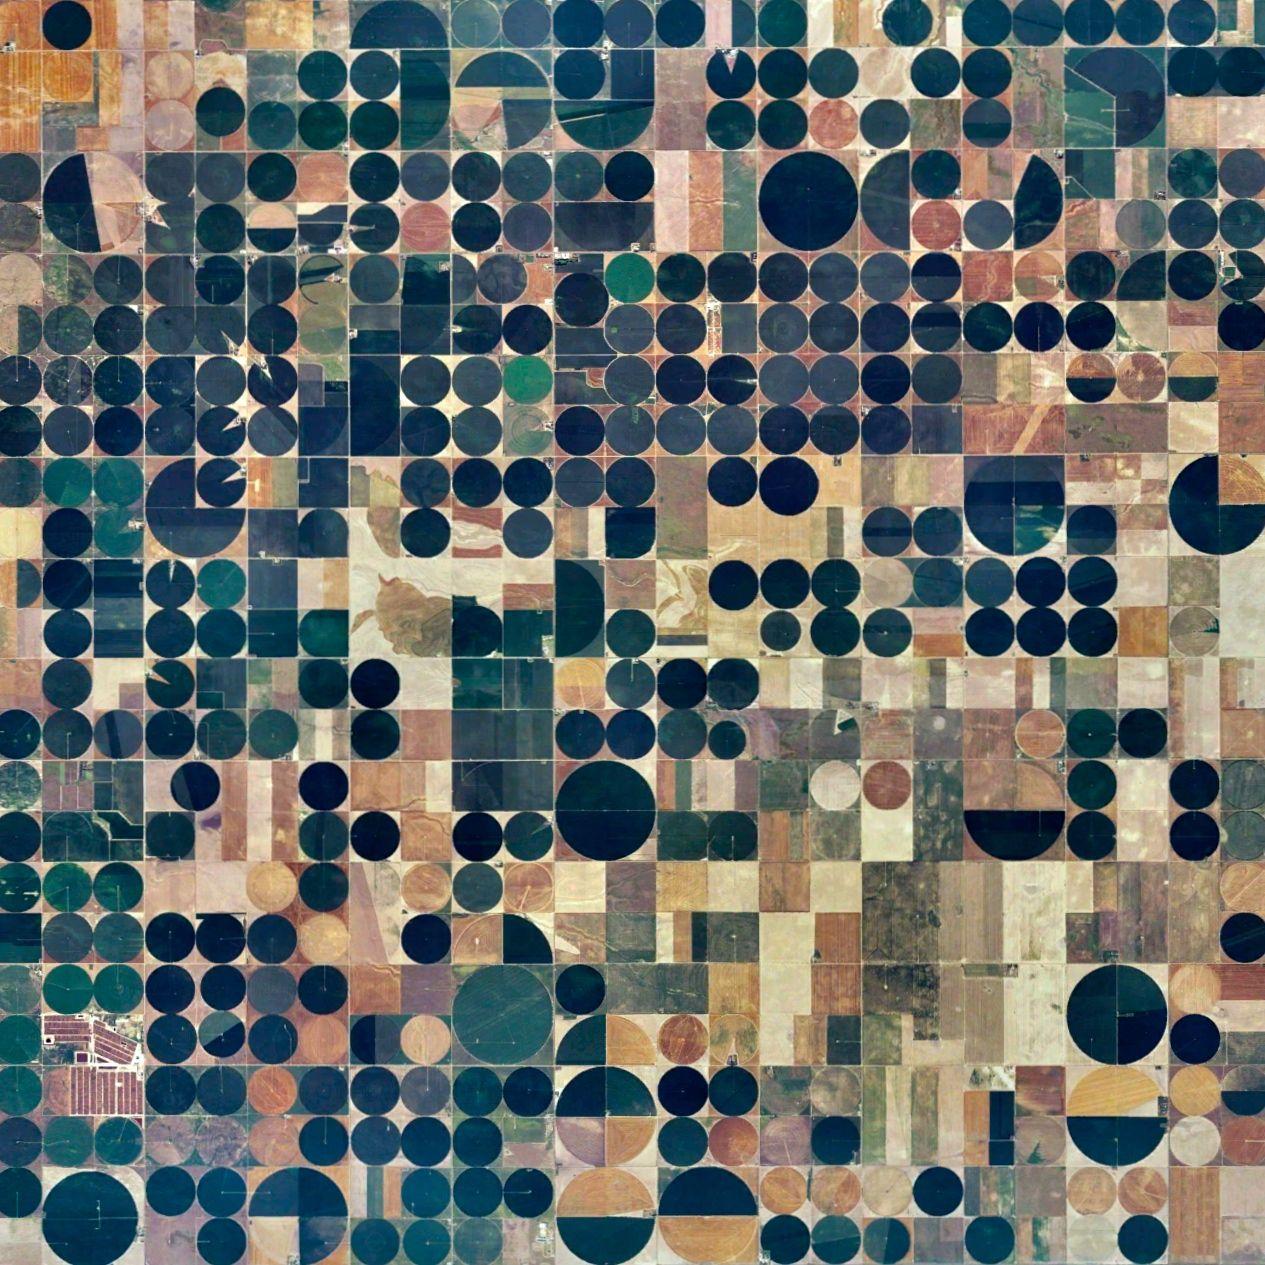 Kansas gray county copeland - 3 25 2015 Center Pivot Irrigation Copeland Kansas Usa 37 631919632